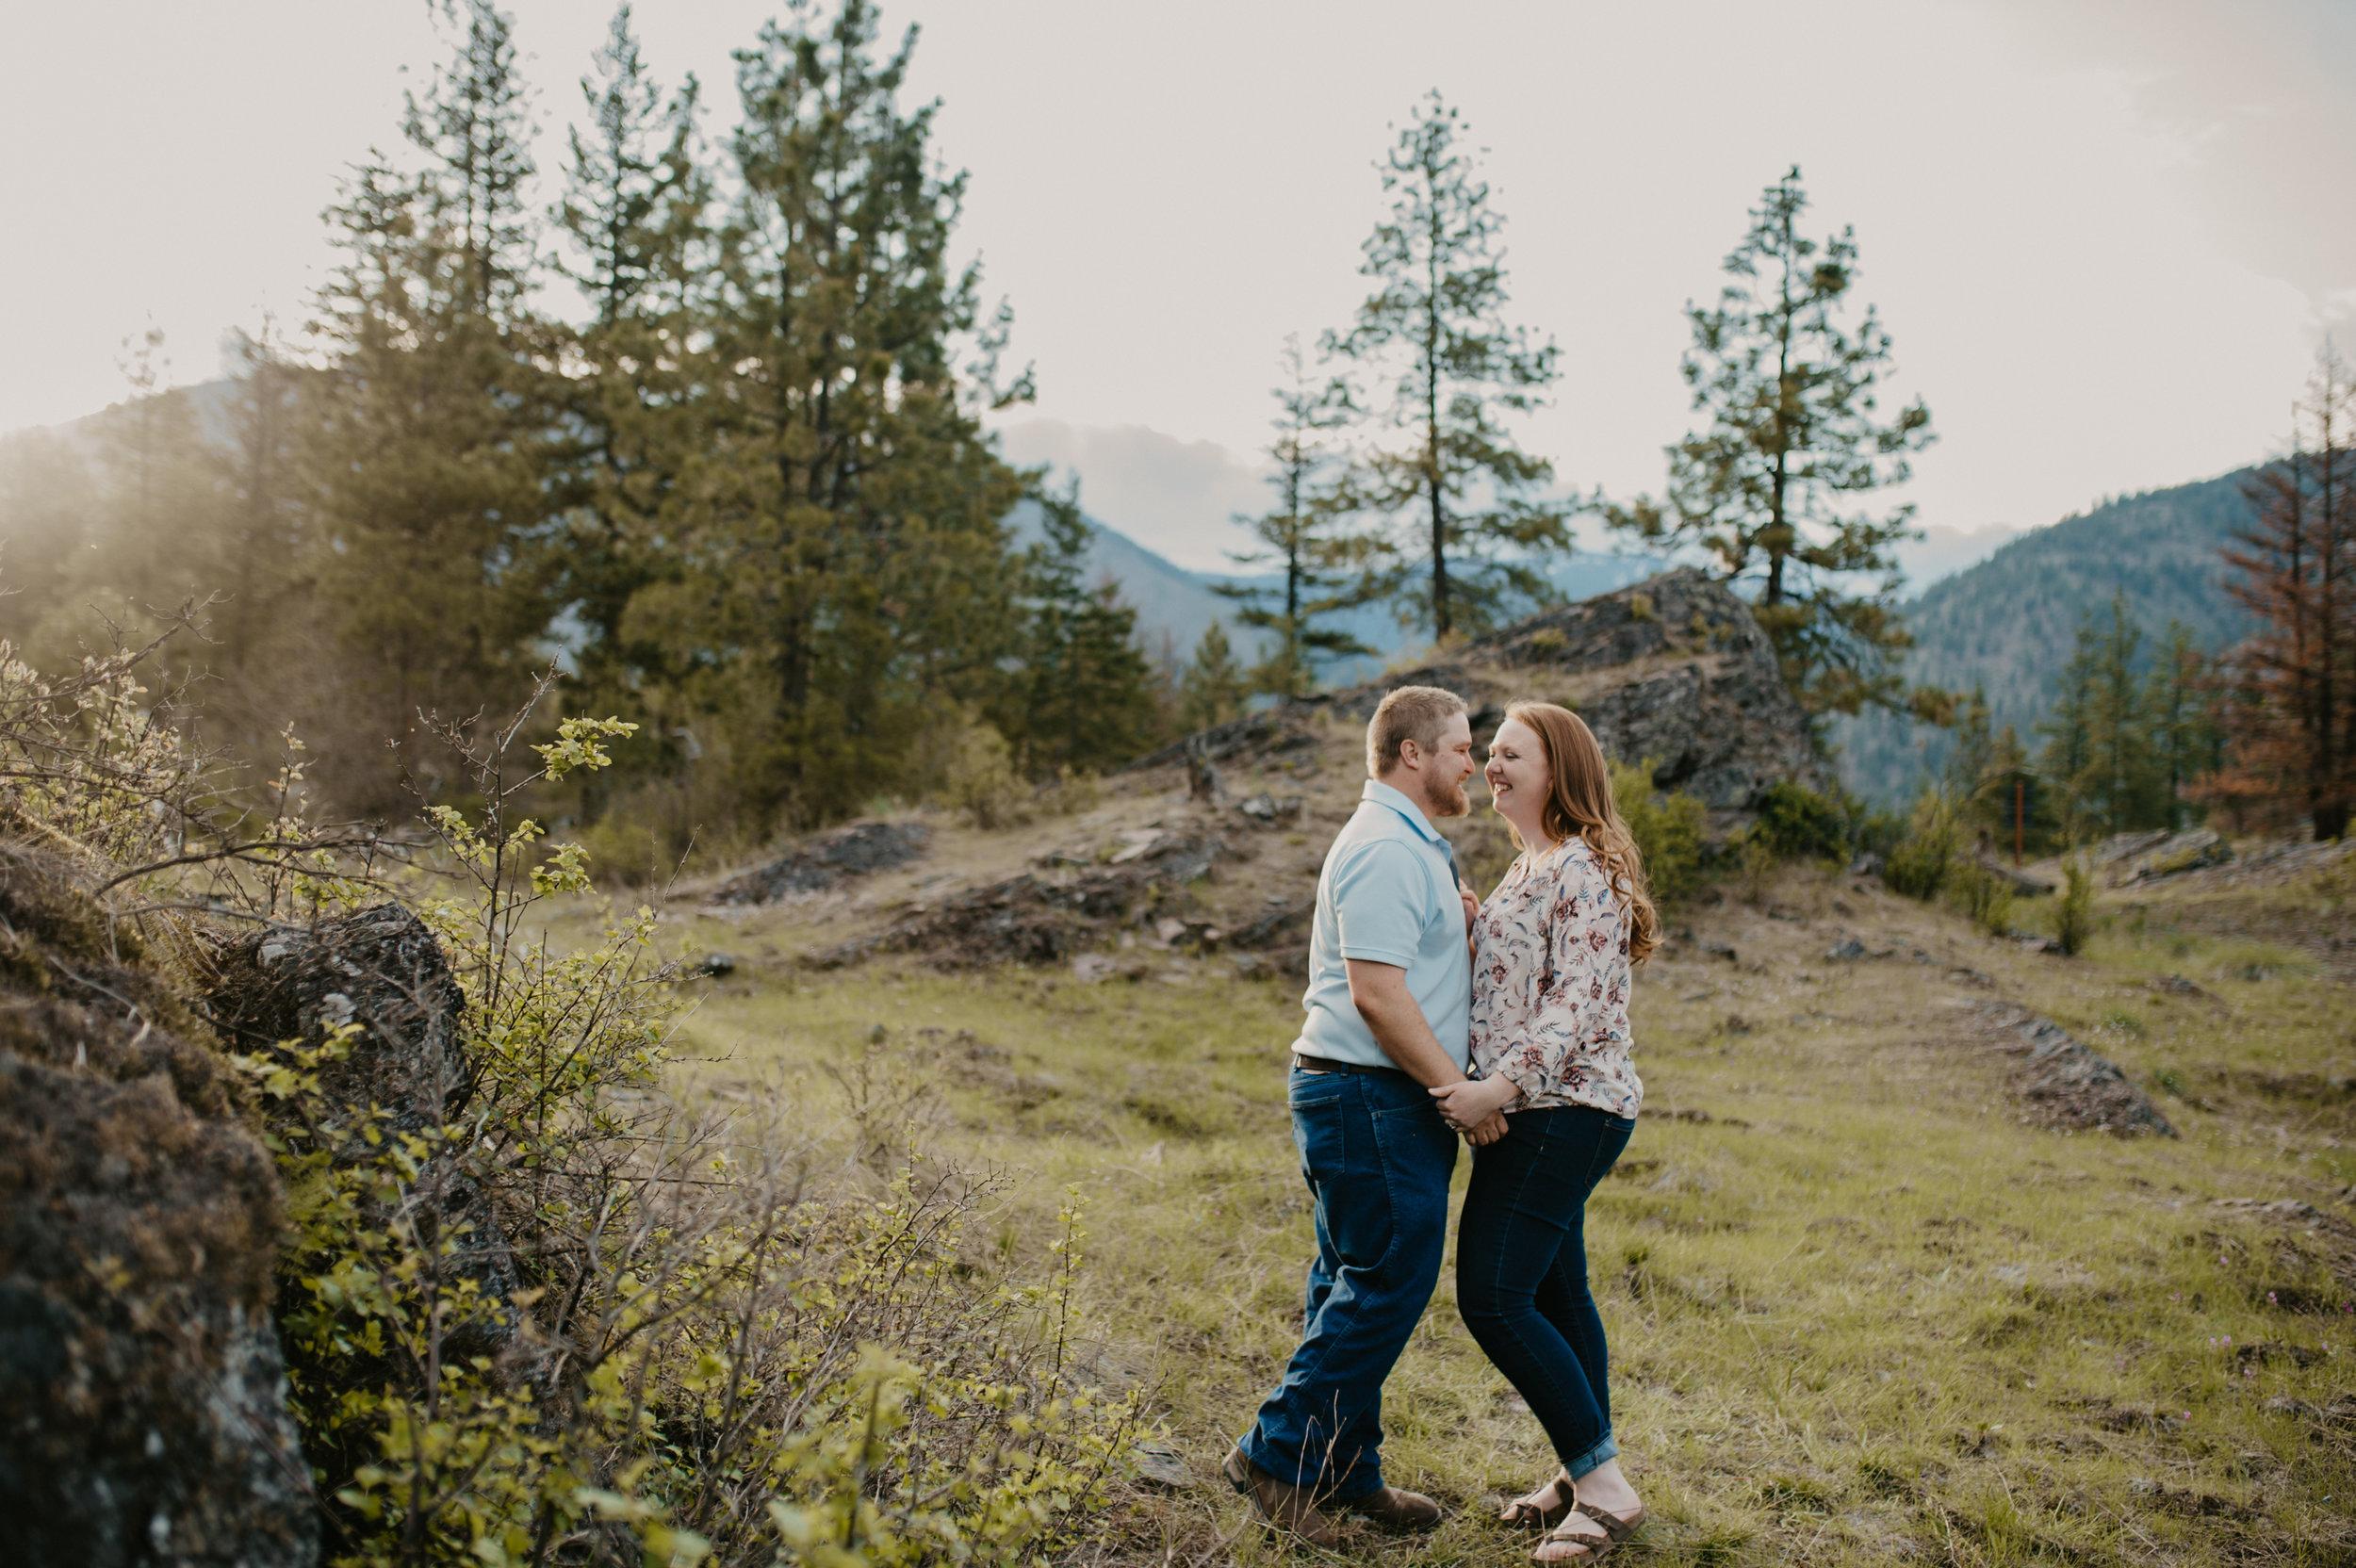 031White Raven Engagement Session_Megan & Justin_Honeybee Weddings_May 10, 2019-76.jpg